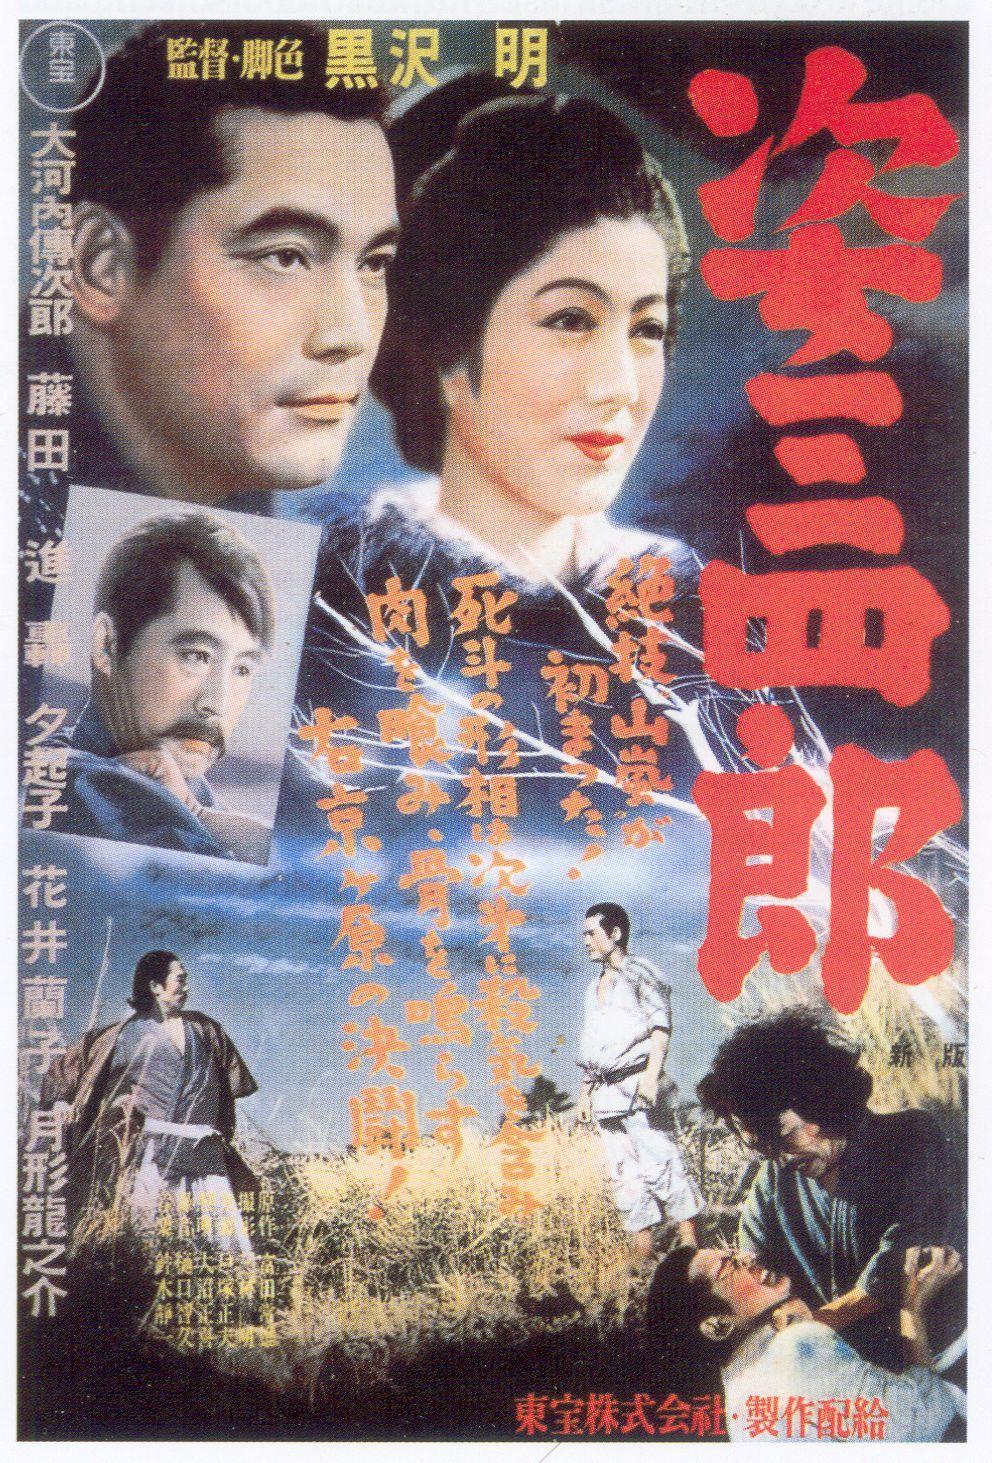 Sugata Sanshiro movie